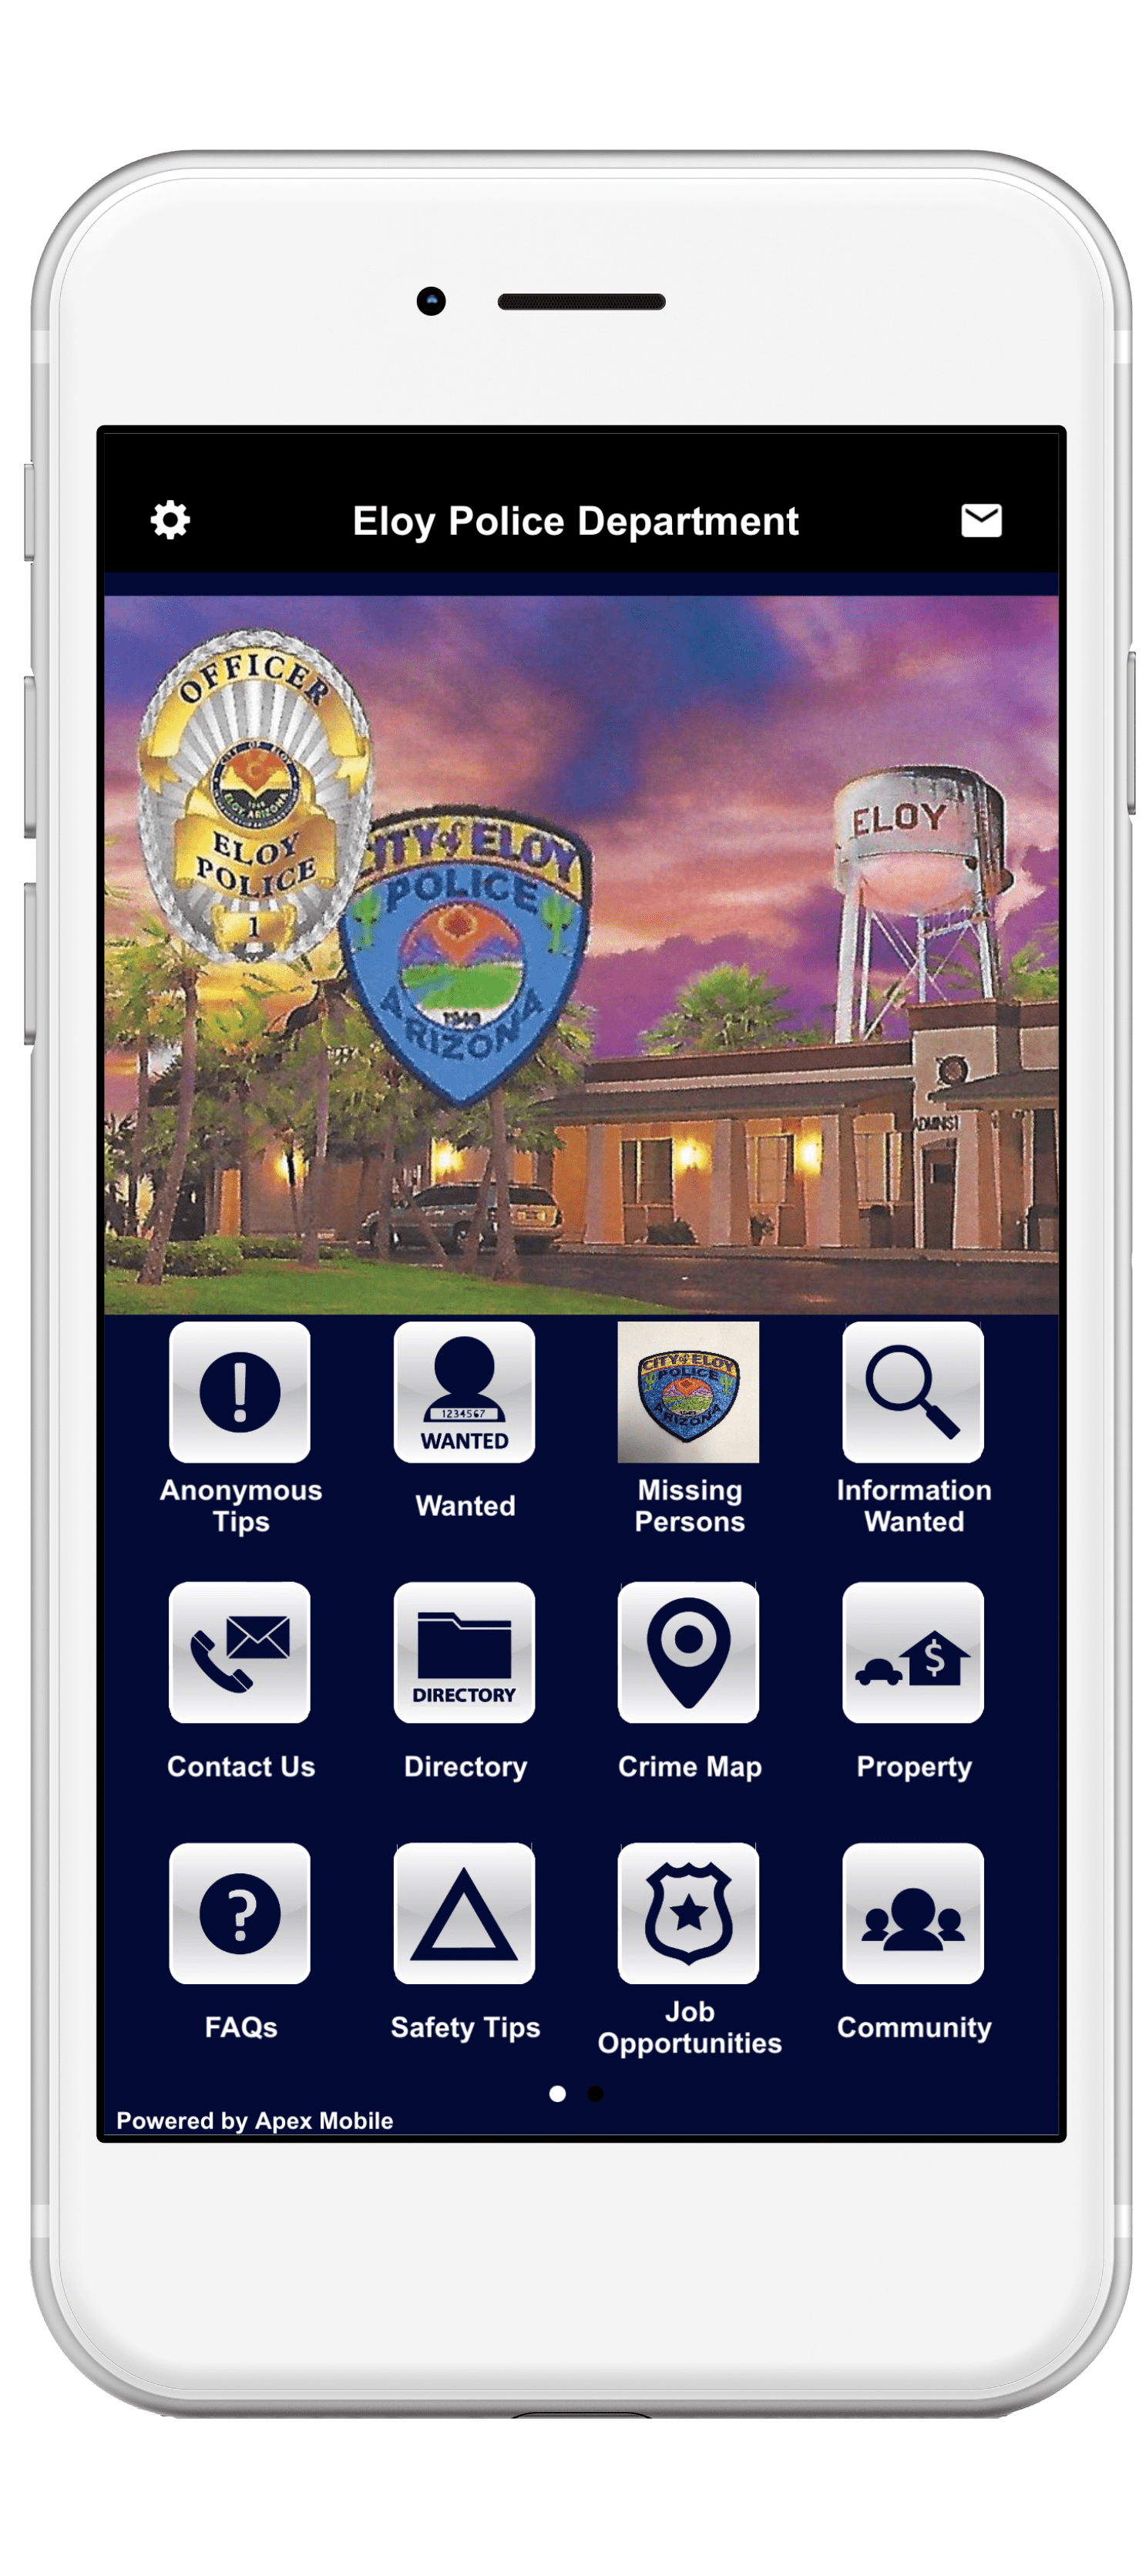 eloy police department mobile app screenshot-min